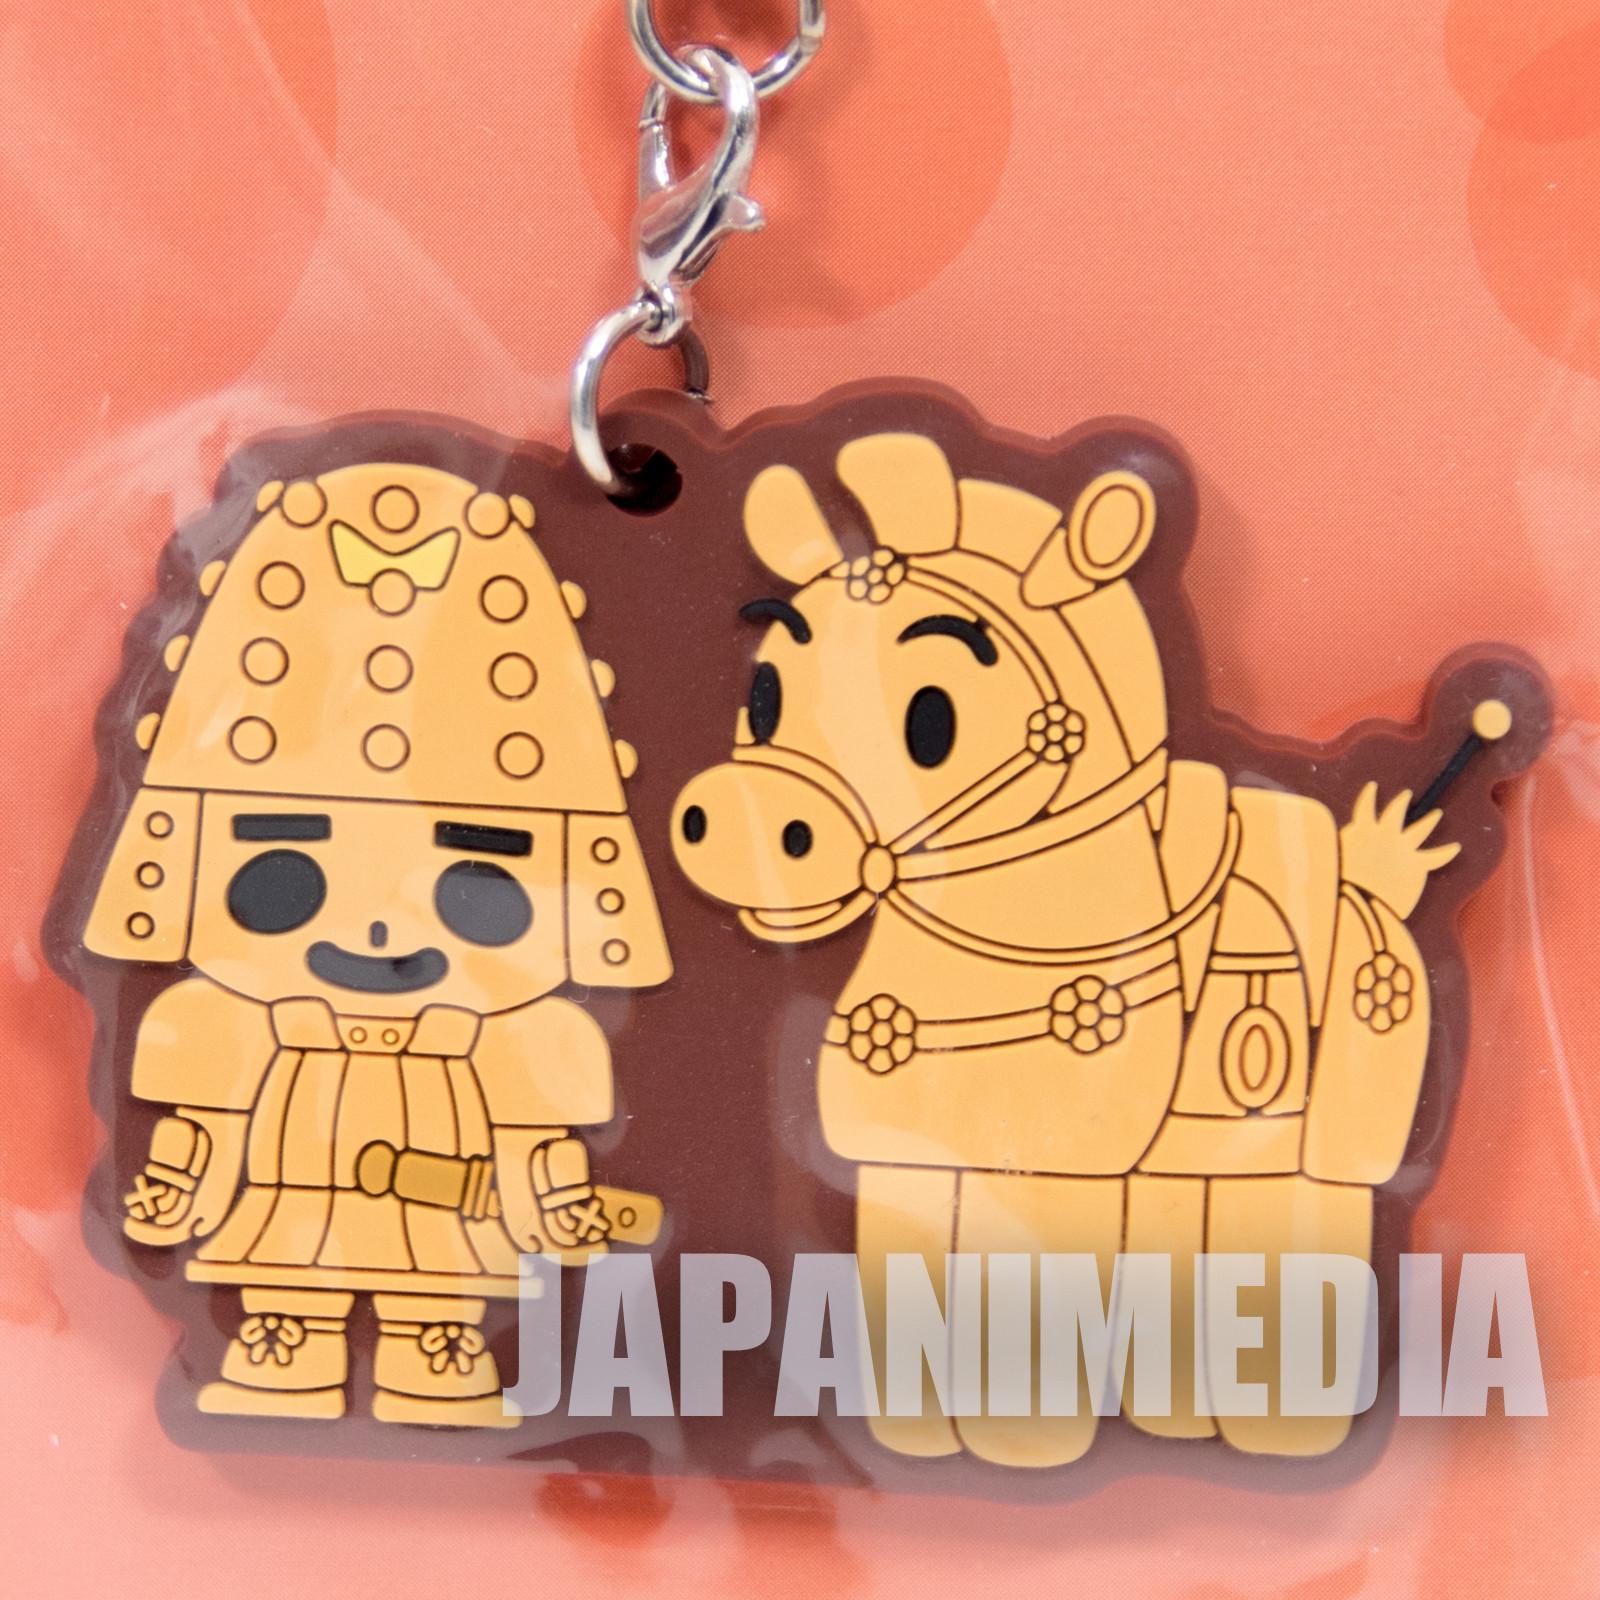 RARE! Ooi Hanimaru Hinbee Rubber Mascot Strap NHK JAPAN NHK TV